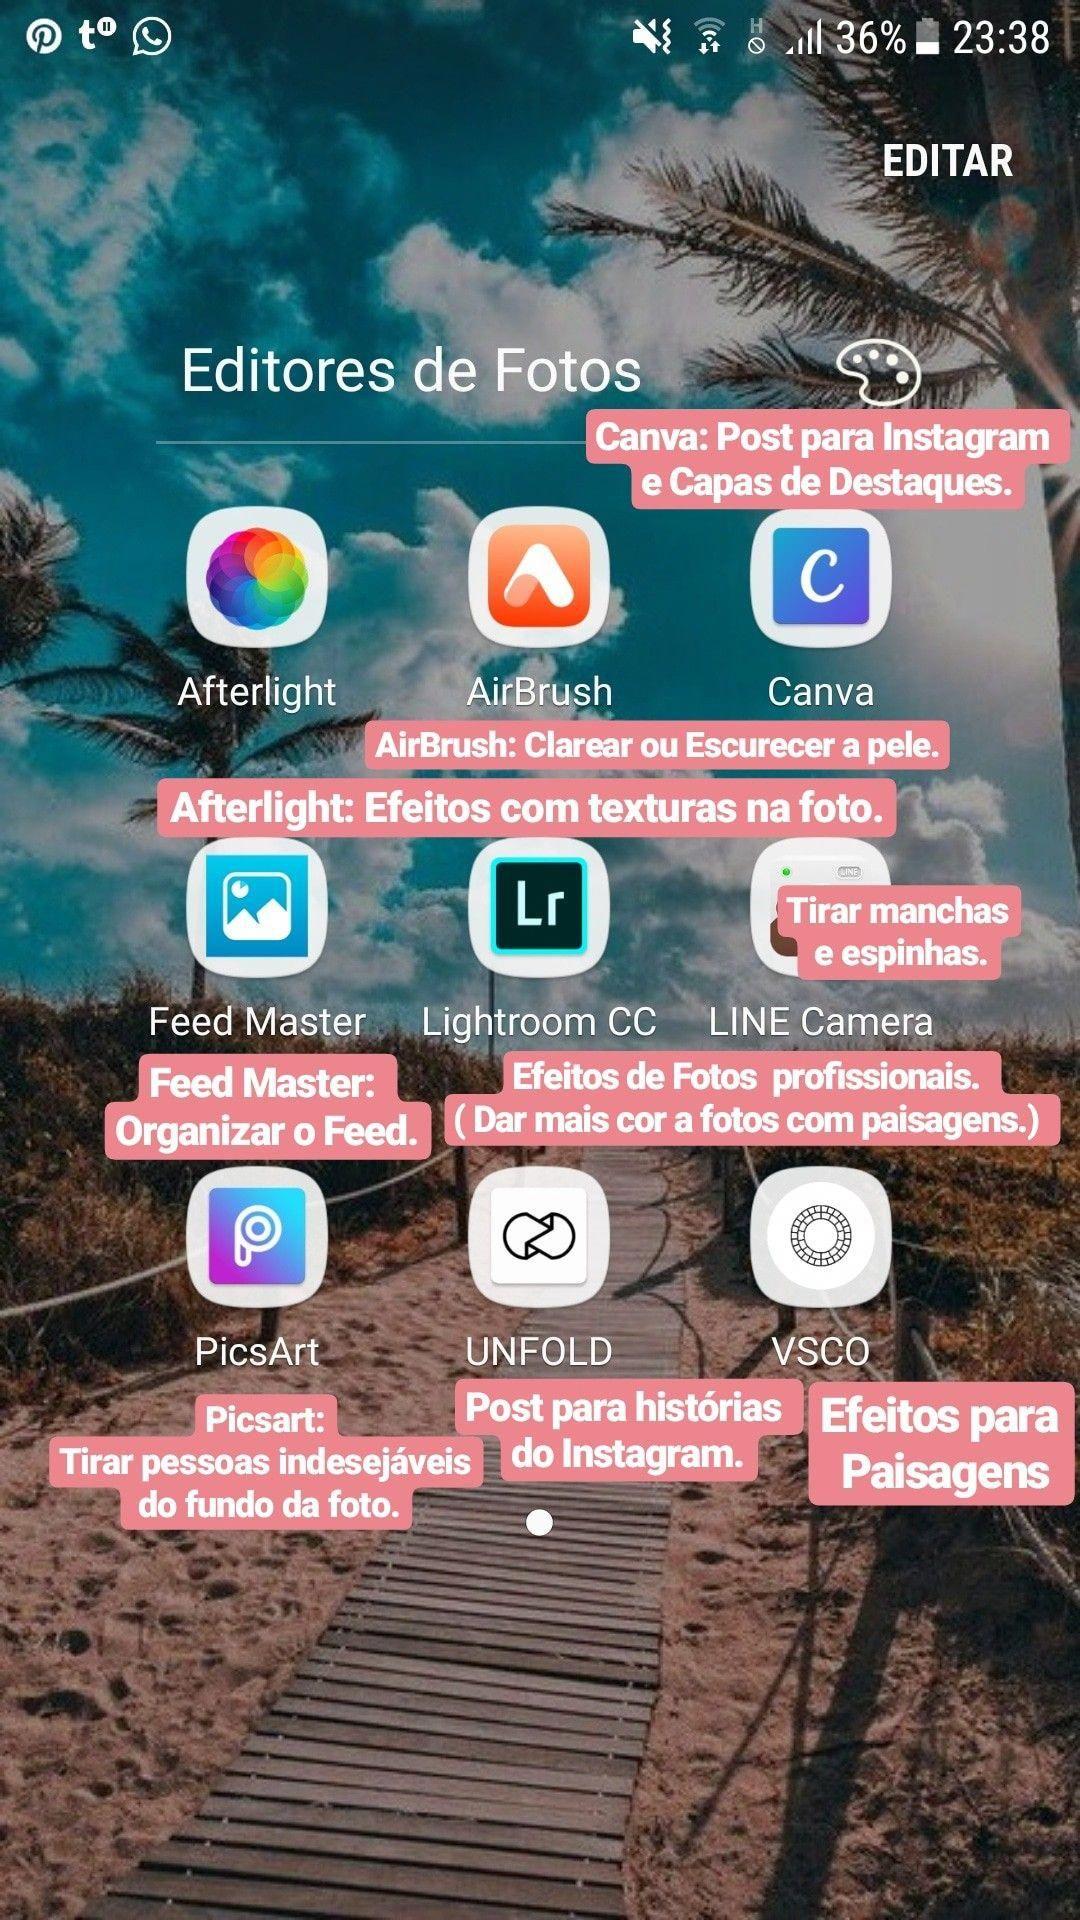 Edits Iphonephotoeditorapp Photography Apps Photo Editing Apps